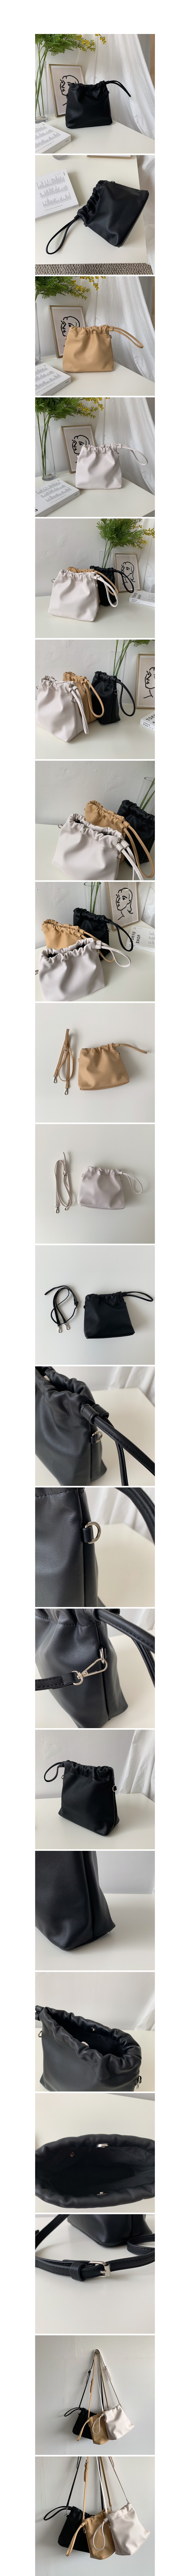 String Tote Cross Bag